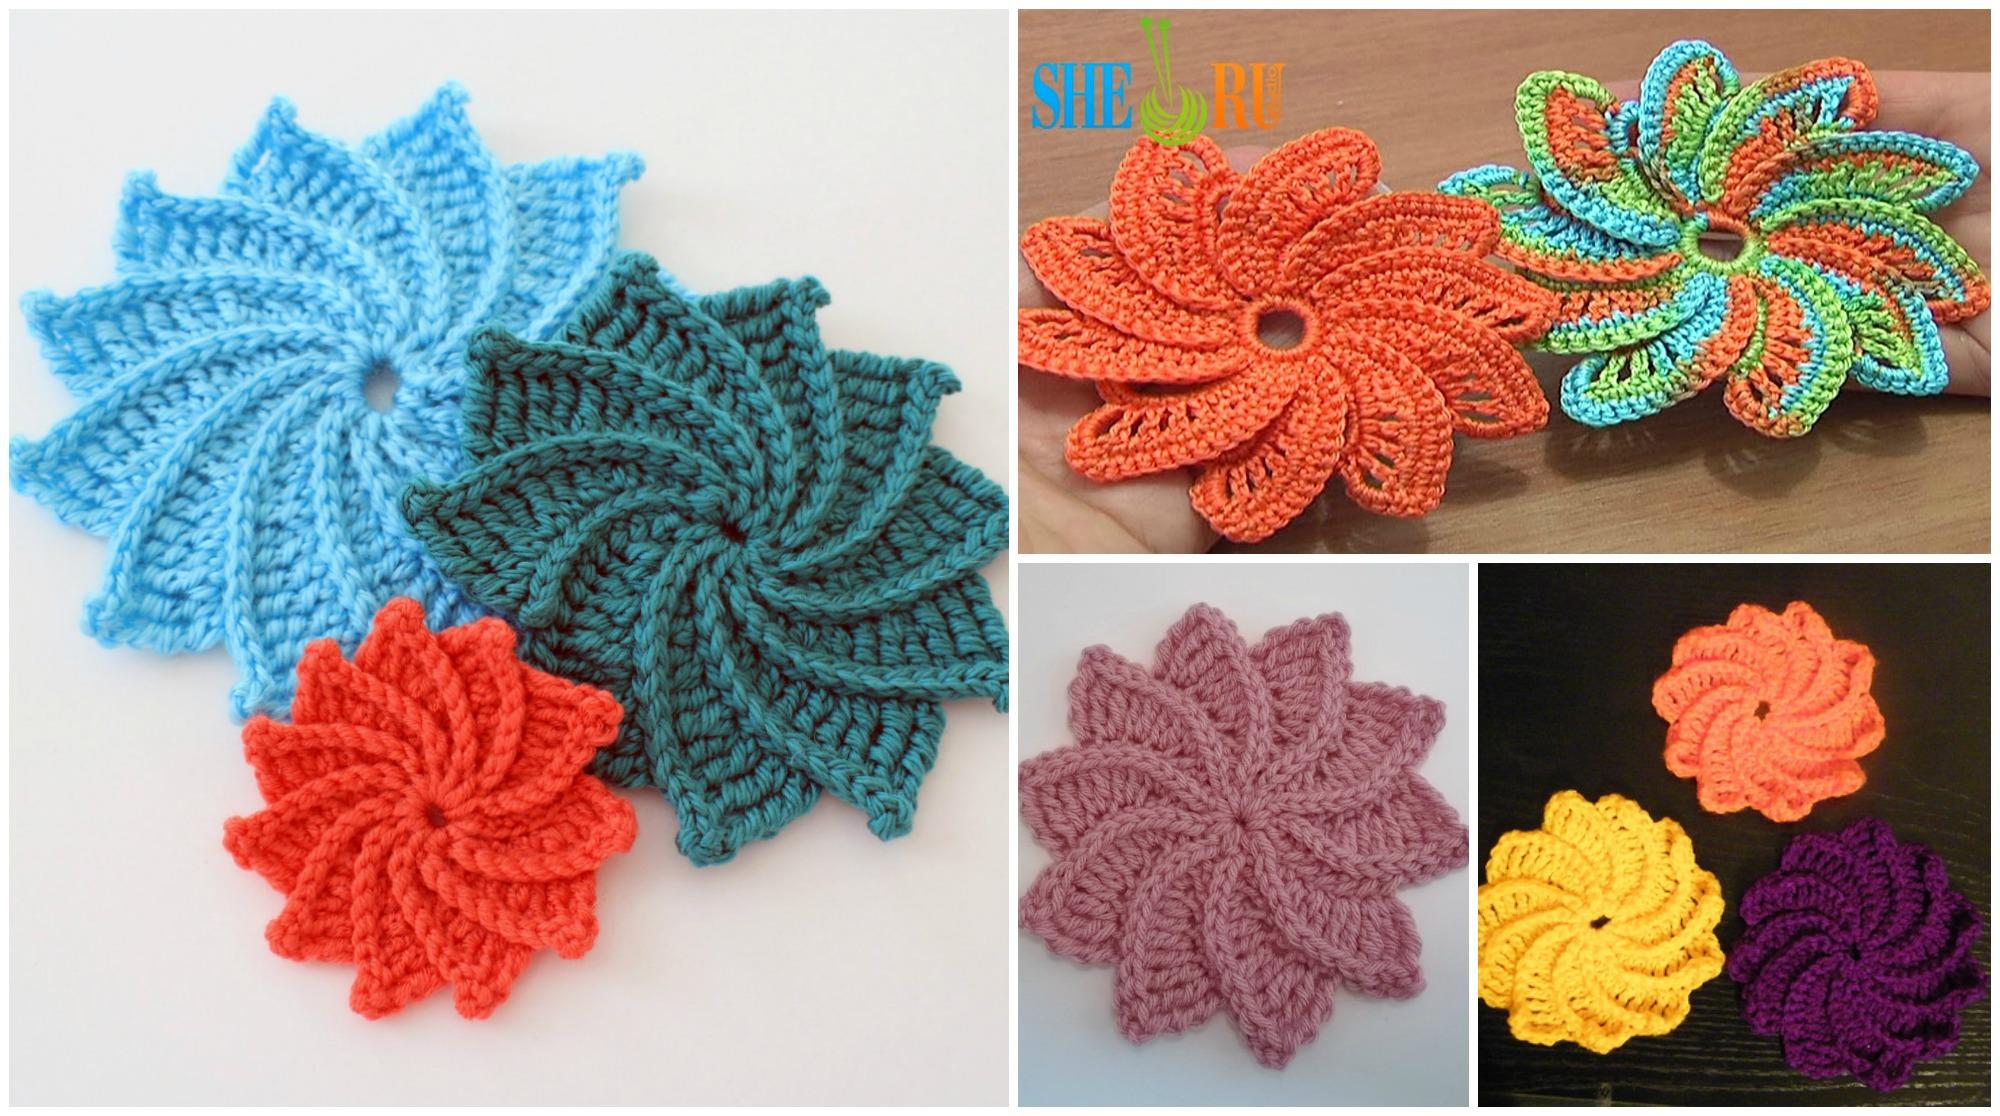 Spiral Crochet Flower Pattern Free : Crochet Spiral Flower